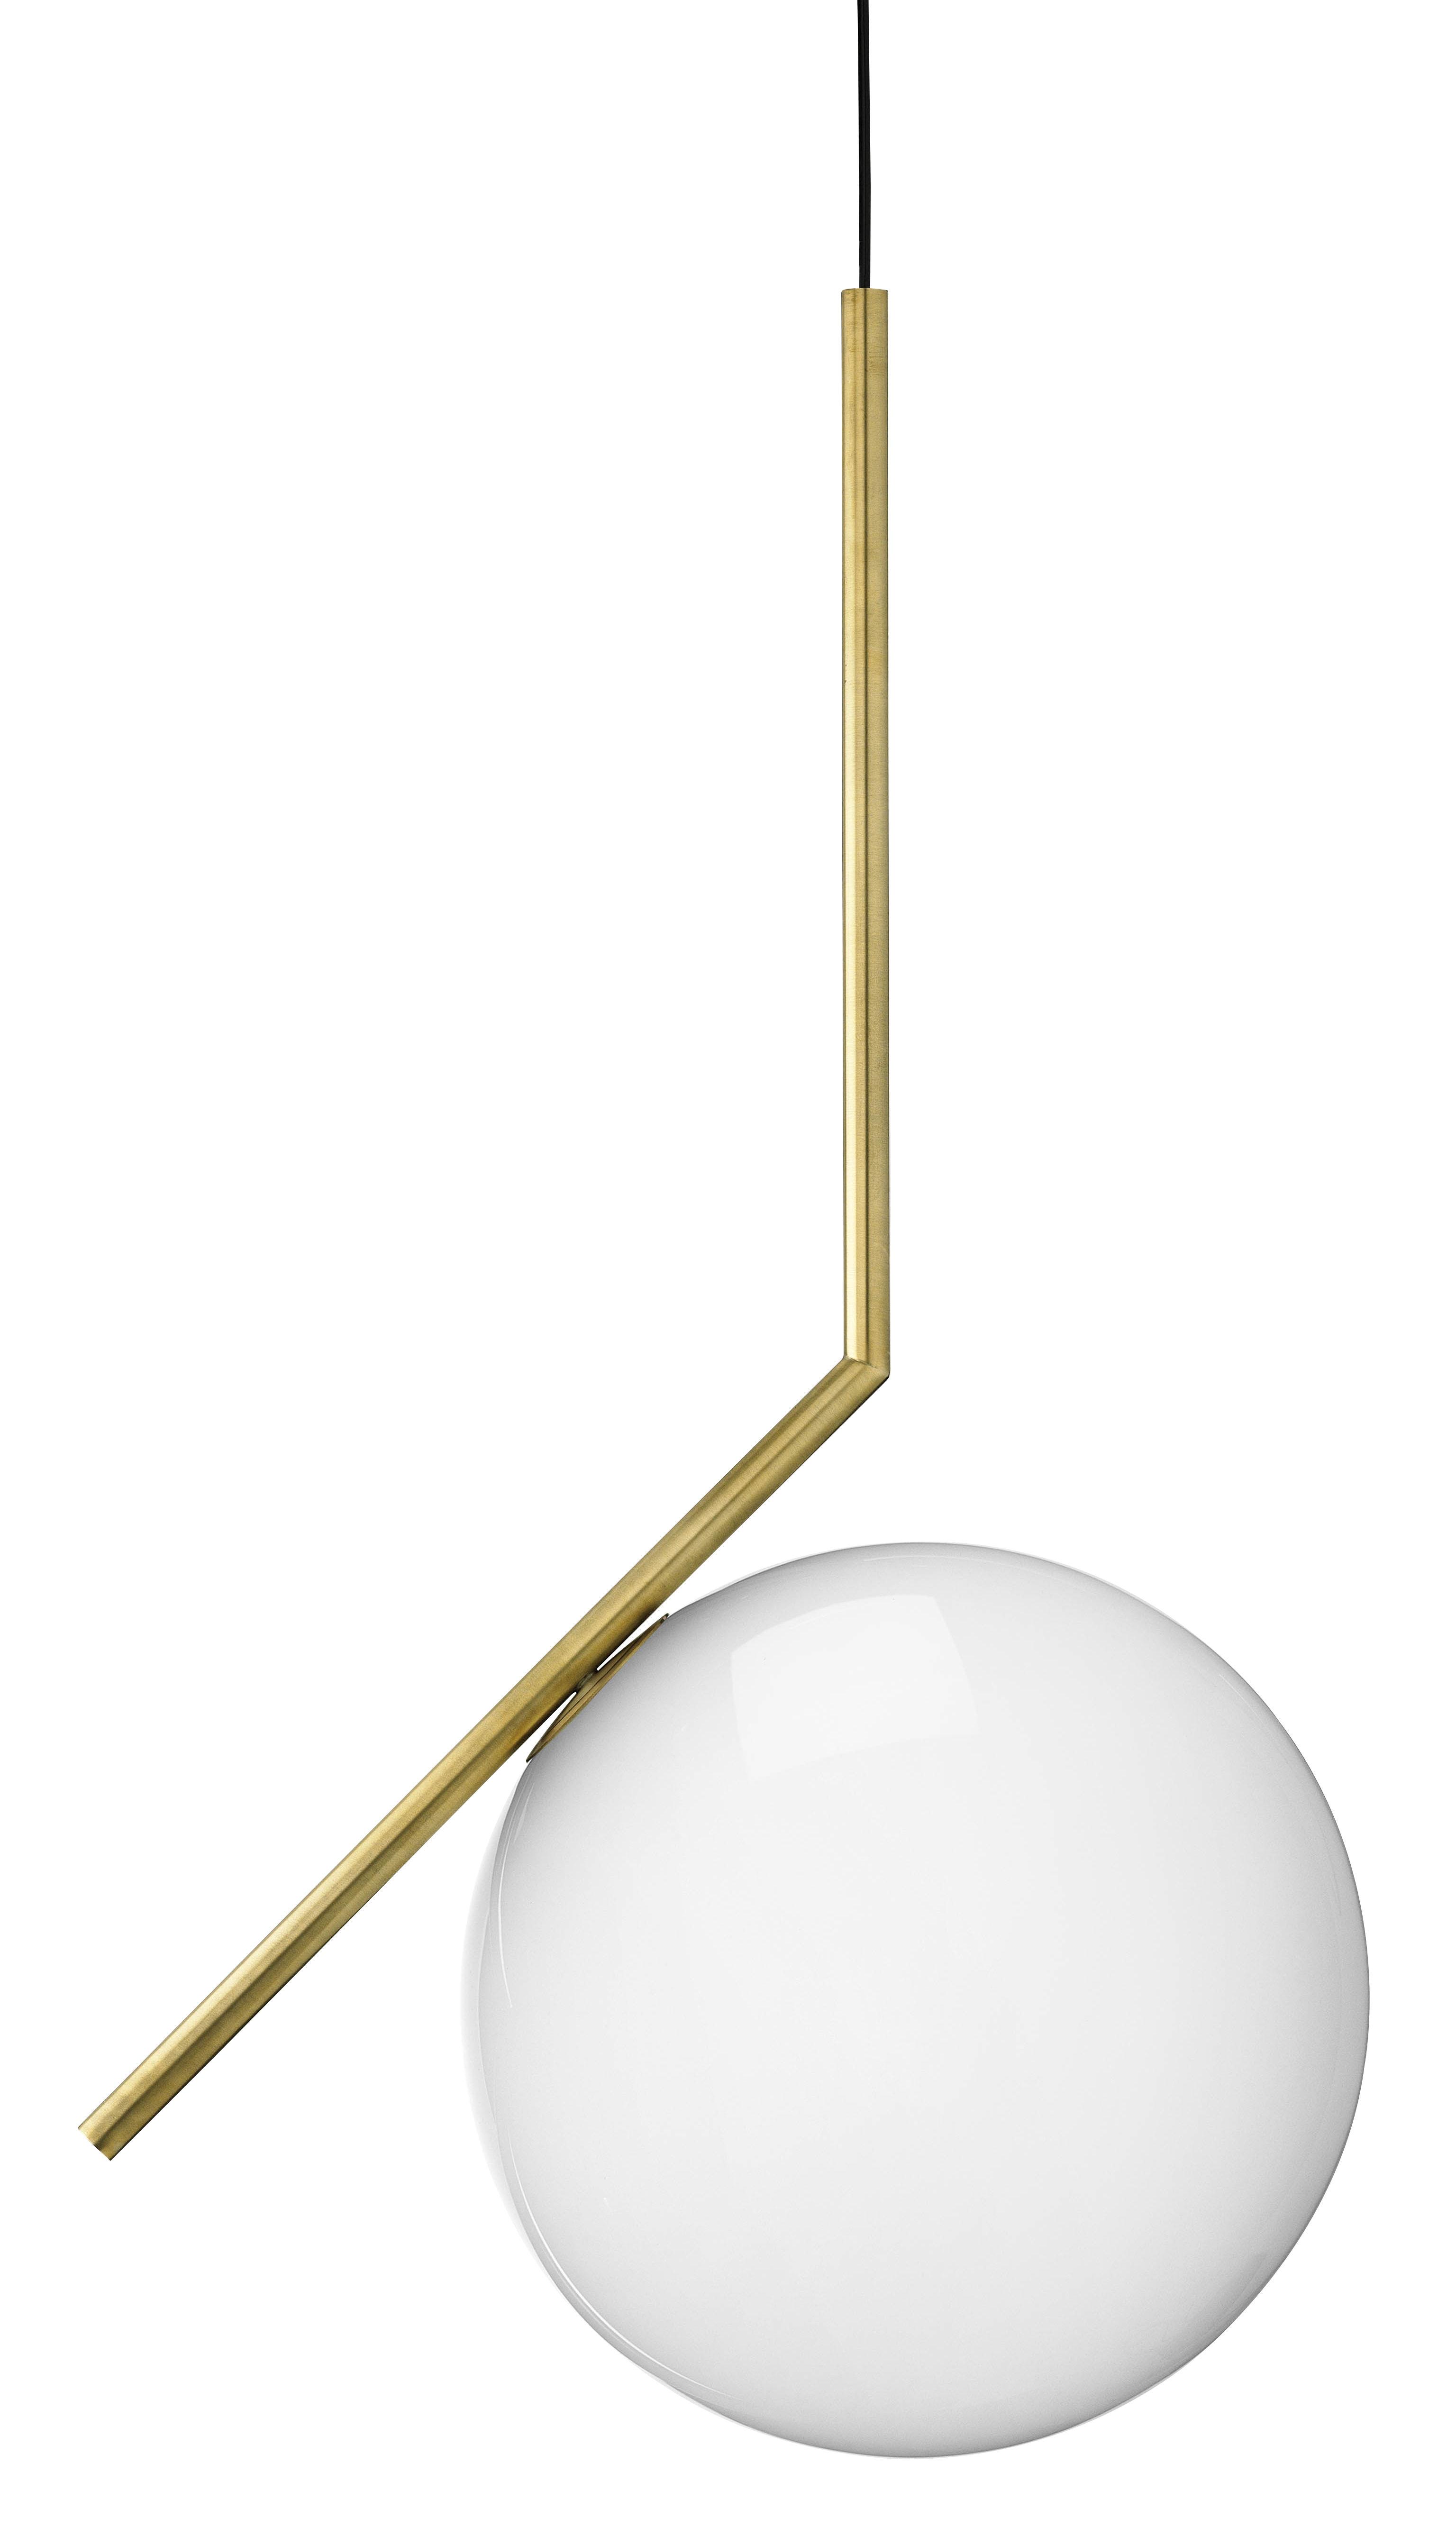 Illuminazione - Lampadari - Sospensione IC S2 - / H 72 cm di Flos - Ottone - Acciaio, vetro soffiato